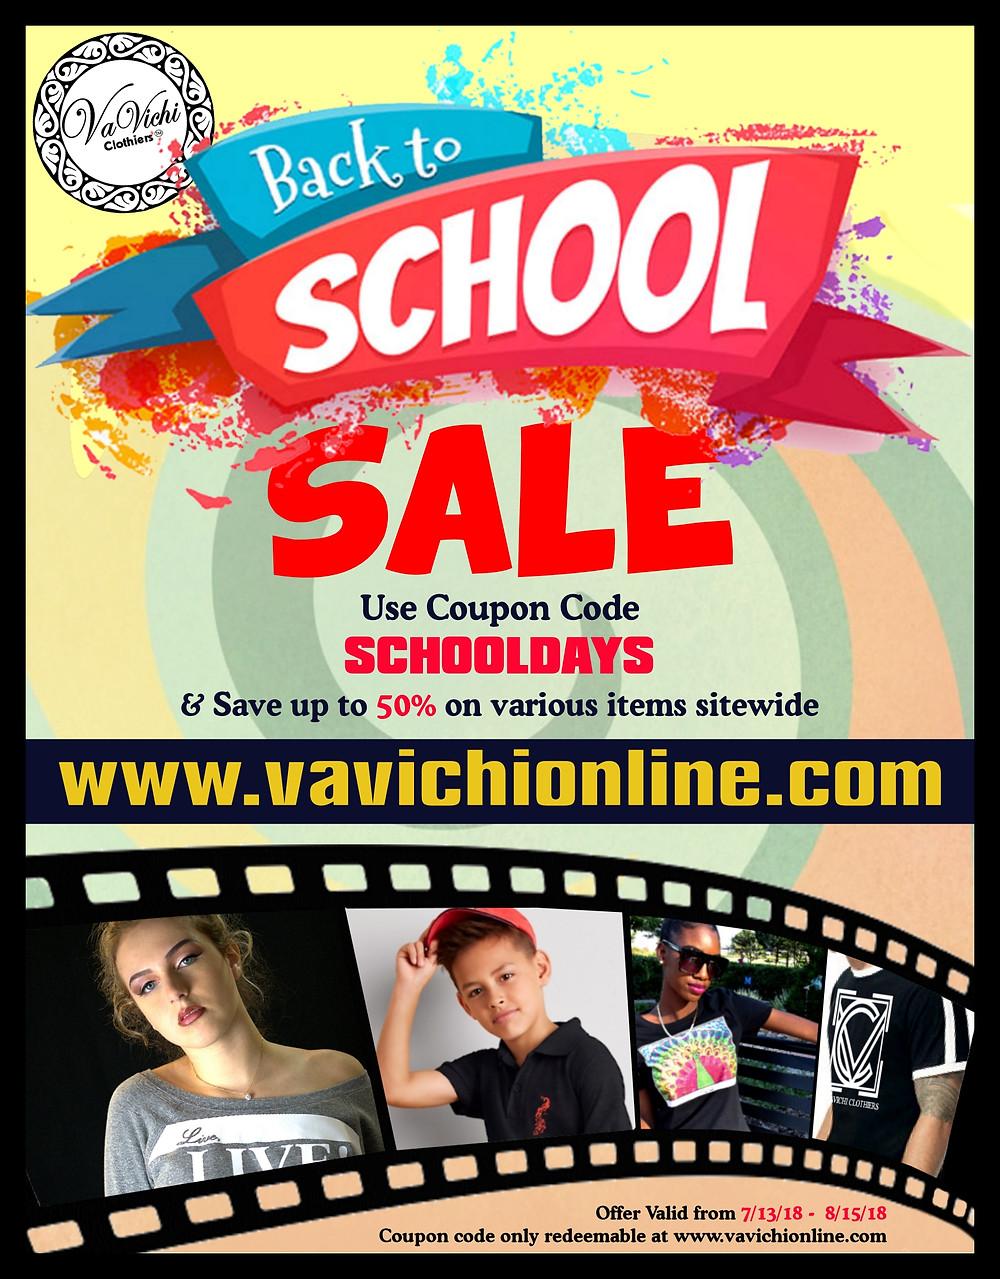 www.vavichionline.com